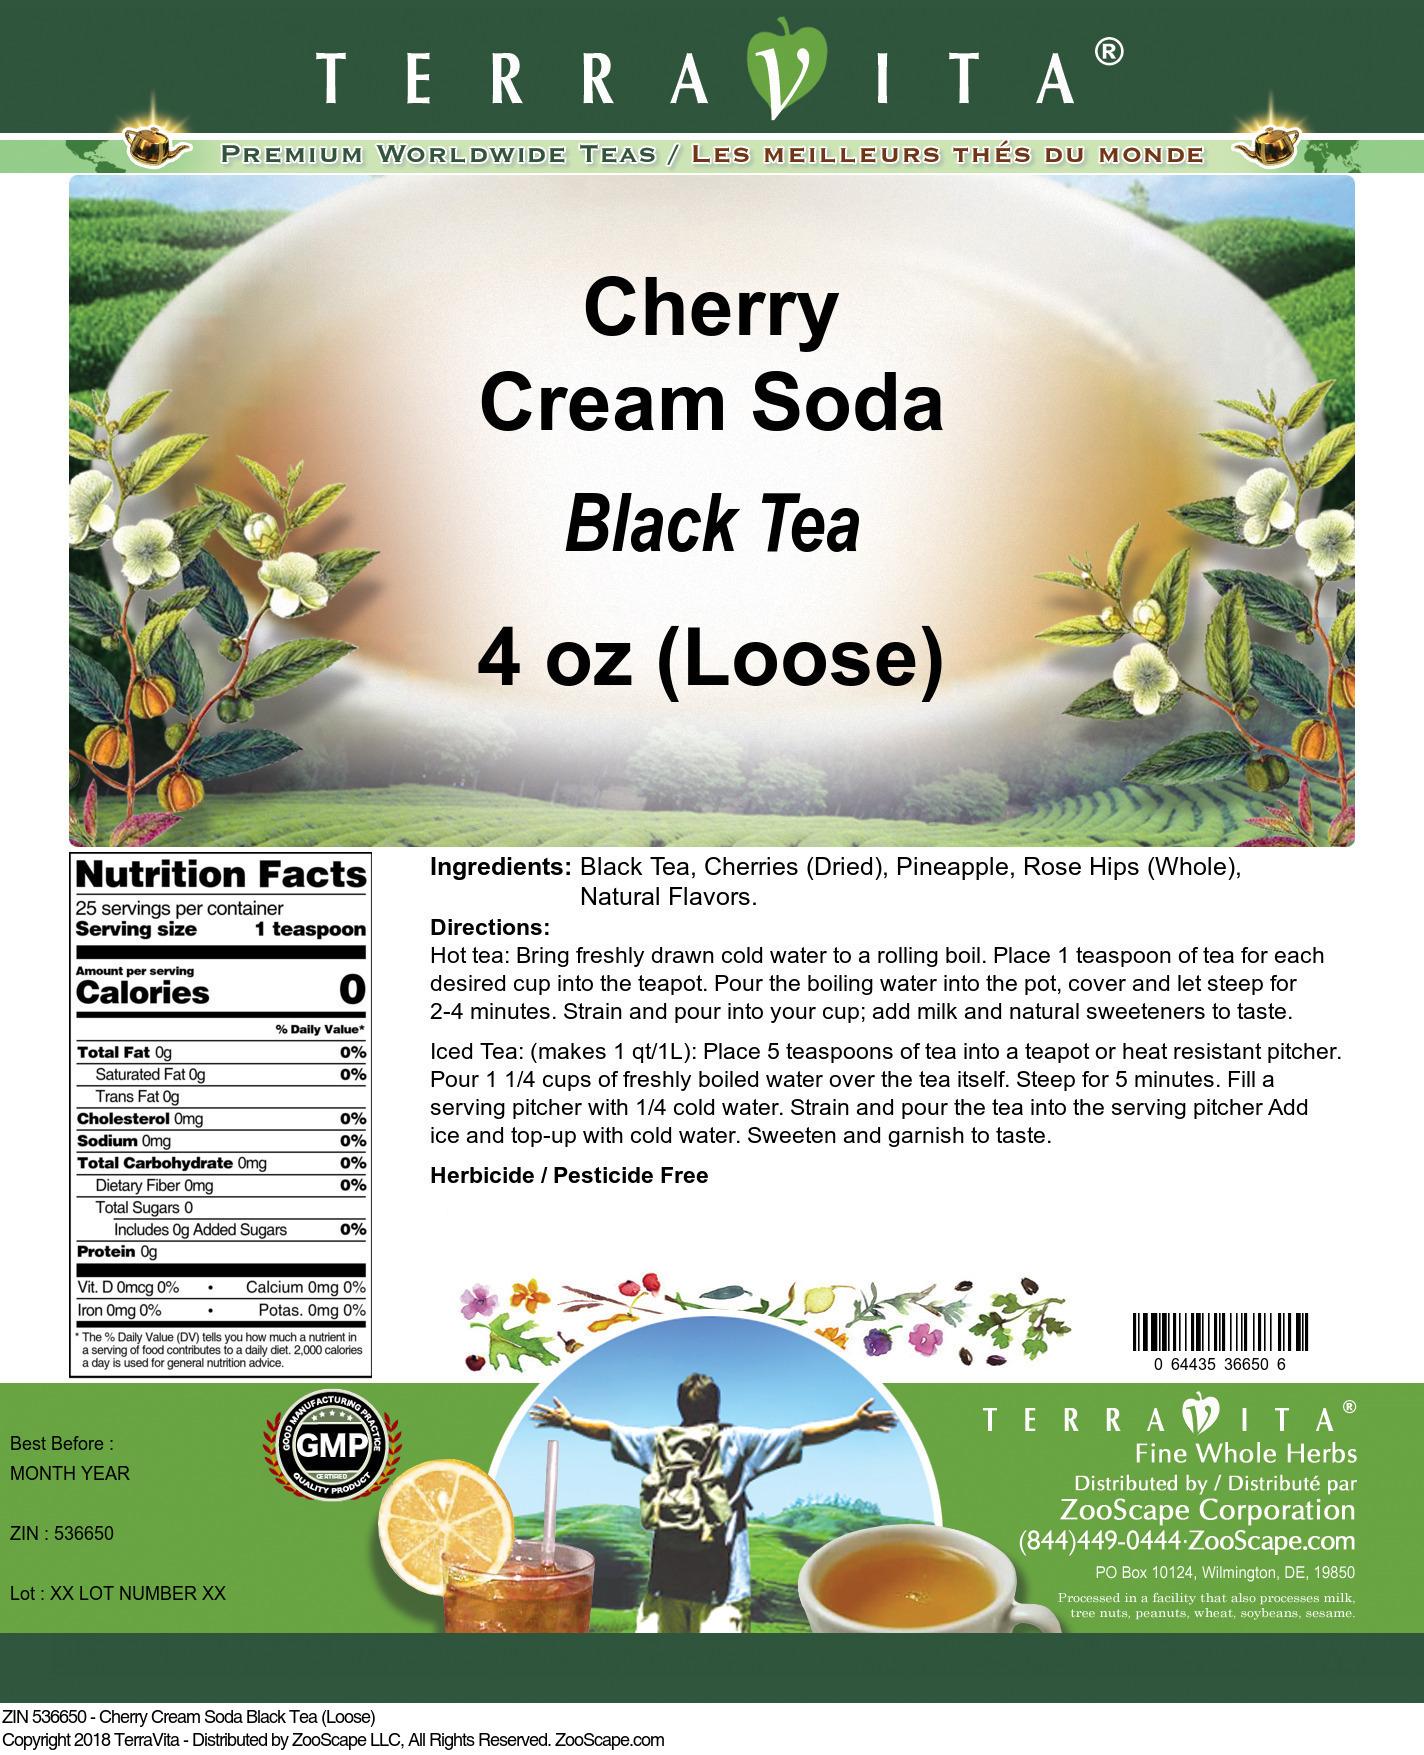 Cherry Cream Soda Black Tea (Loose)